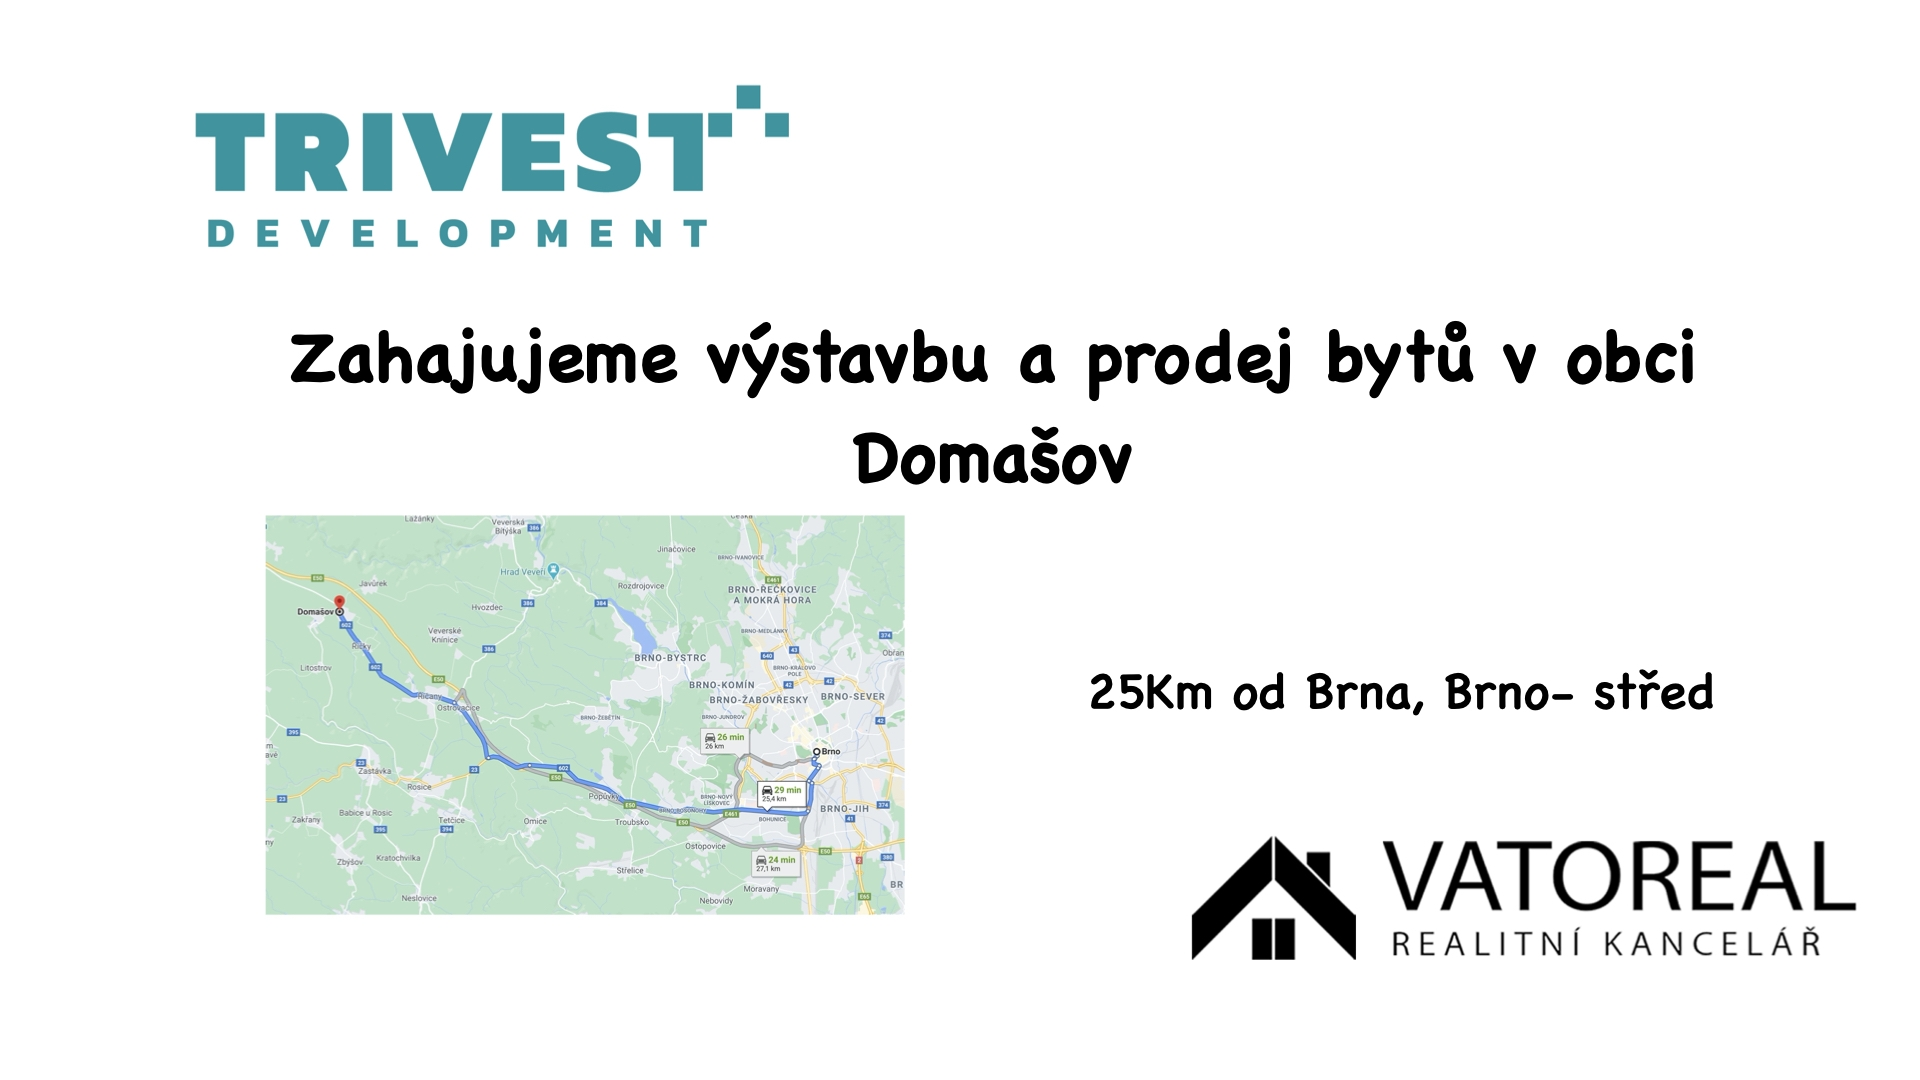 Trivest development